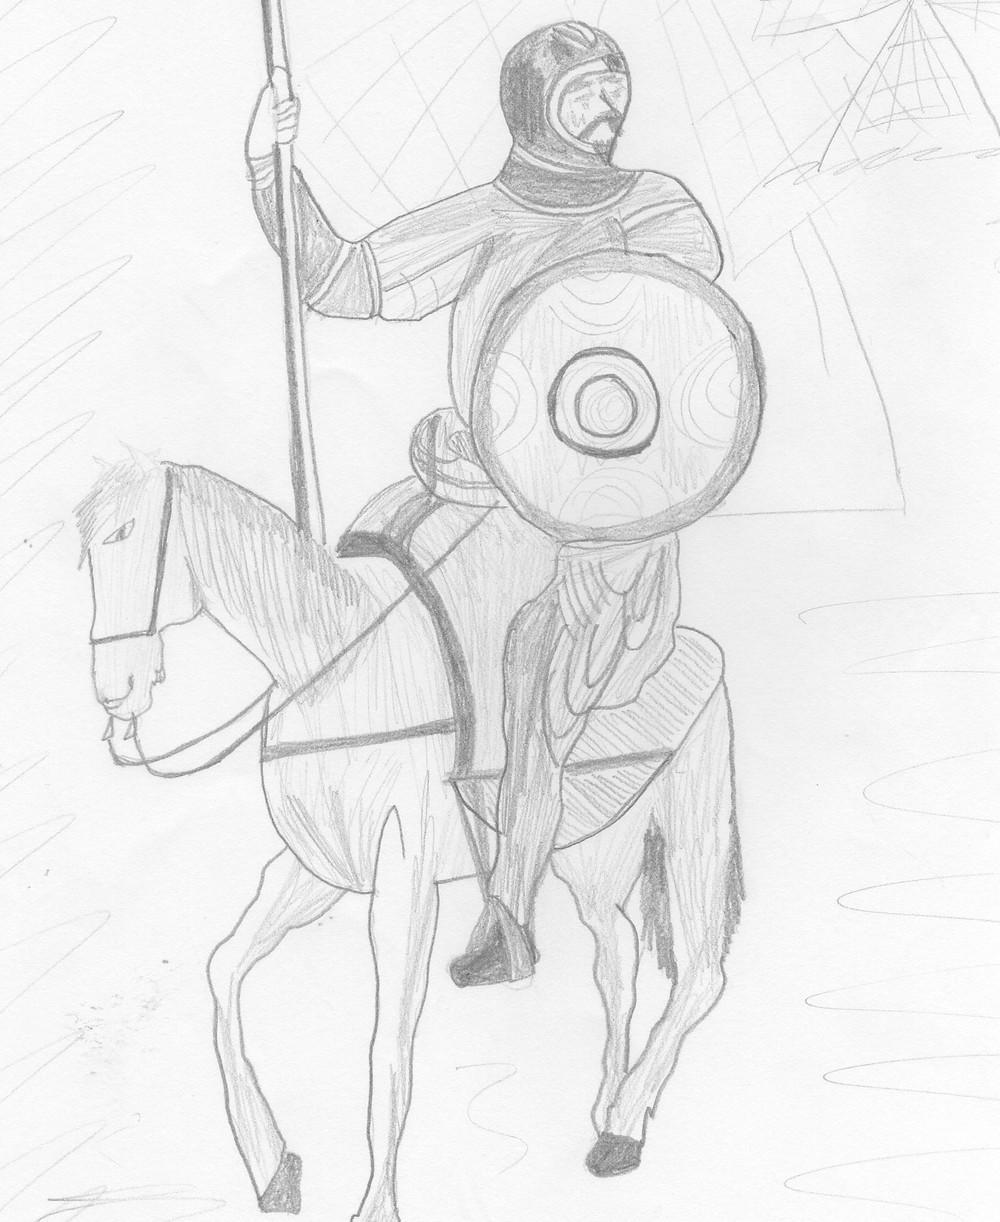 Dibujo original de la alumna Ana Tsiklauri.